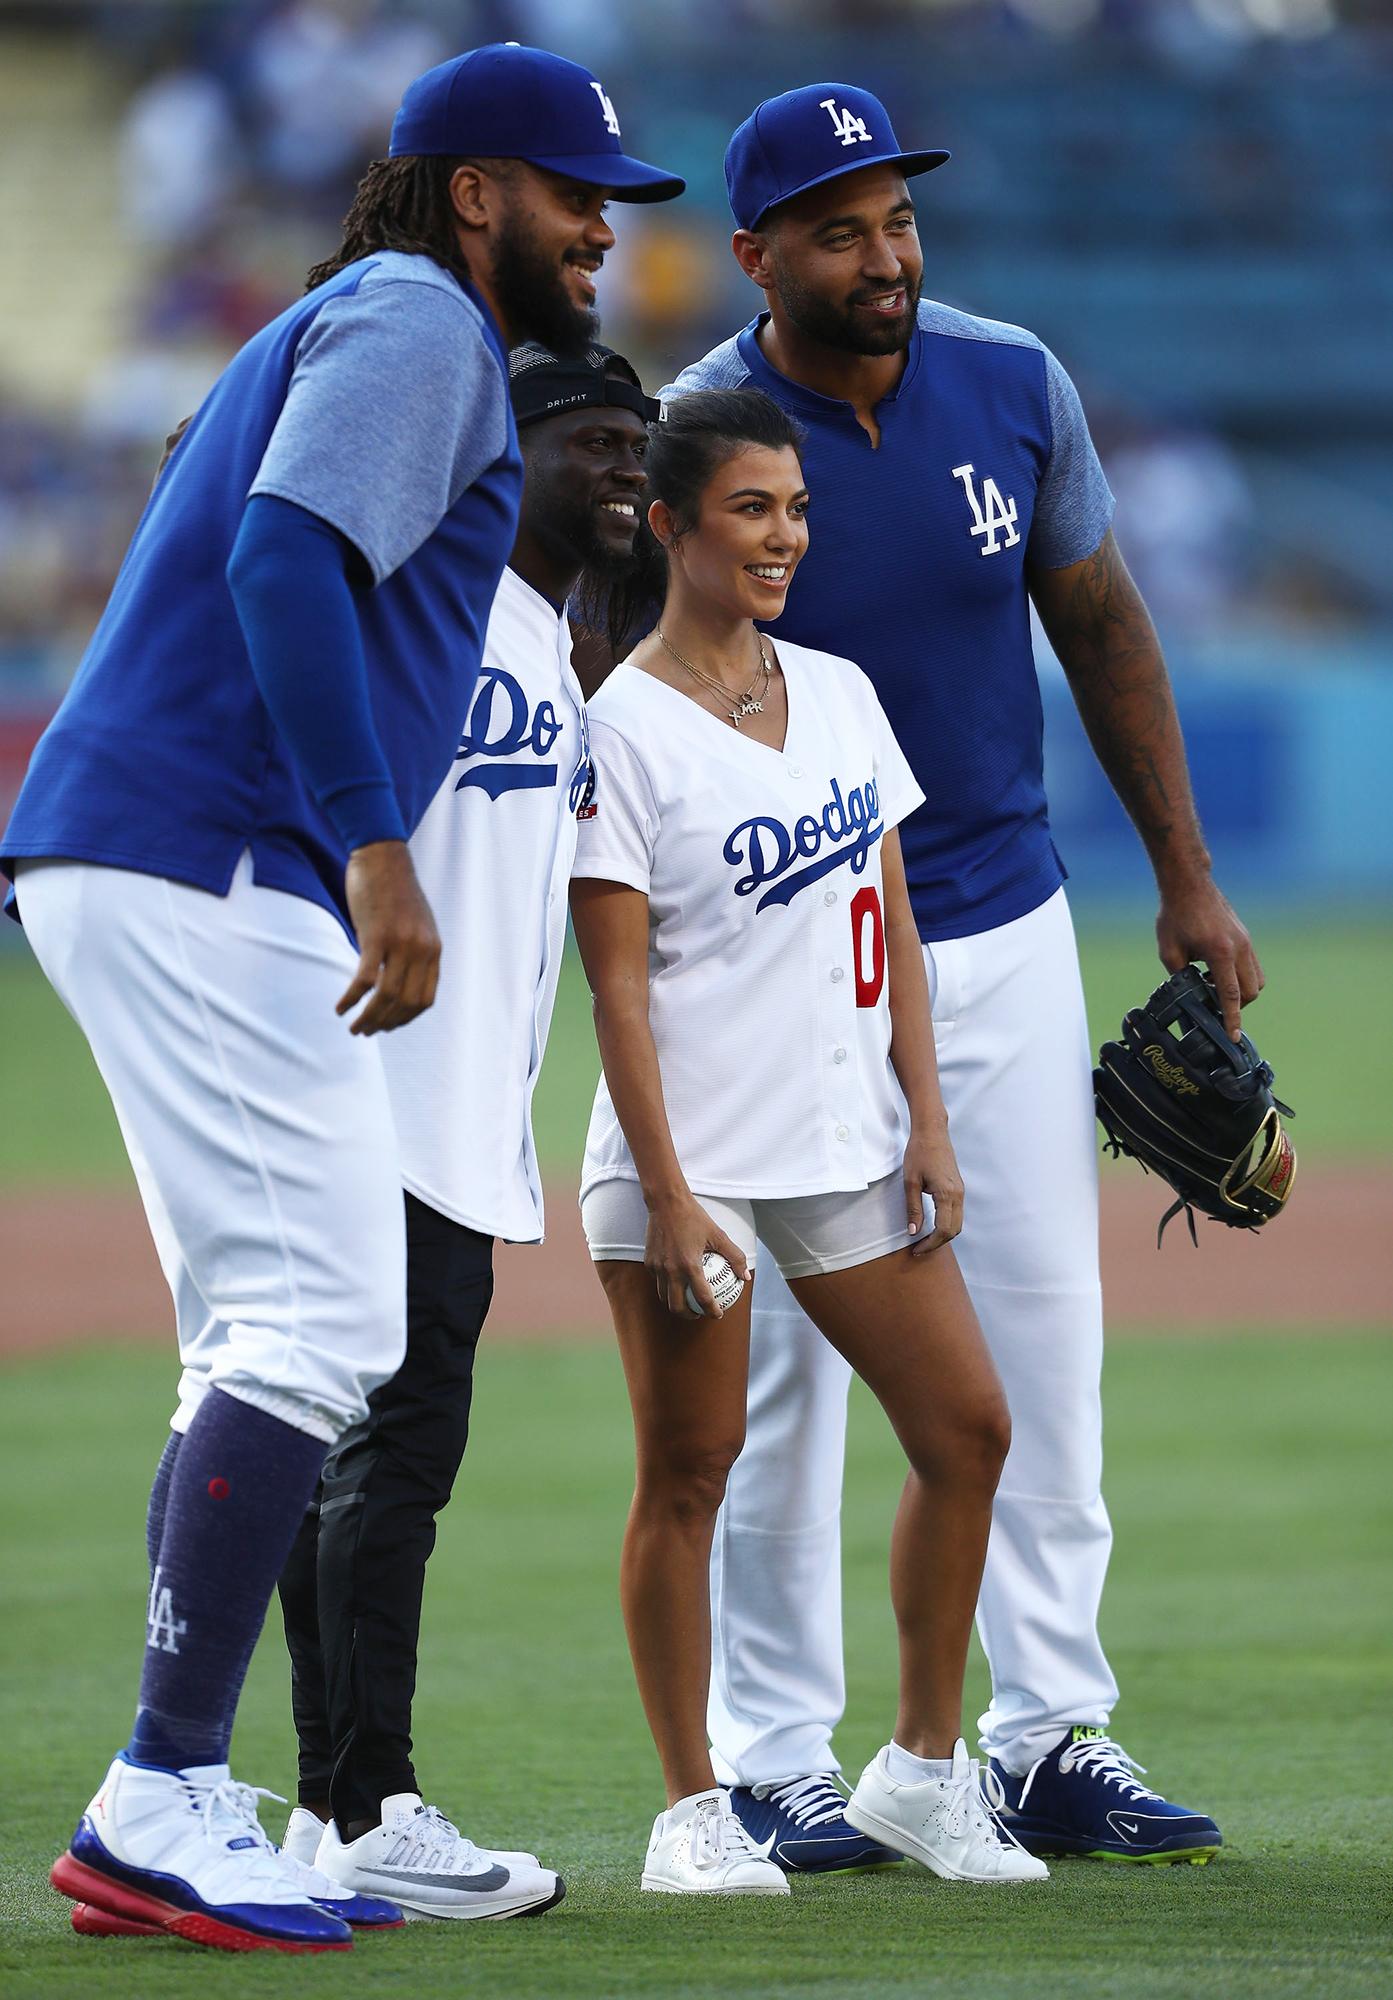 ¿Cuánto mide Kourtney Kardashian? - Altura - Real height 05-kourtney-kardashian-throws-first-pitch